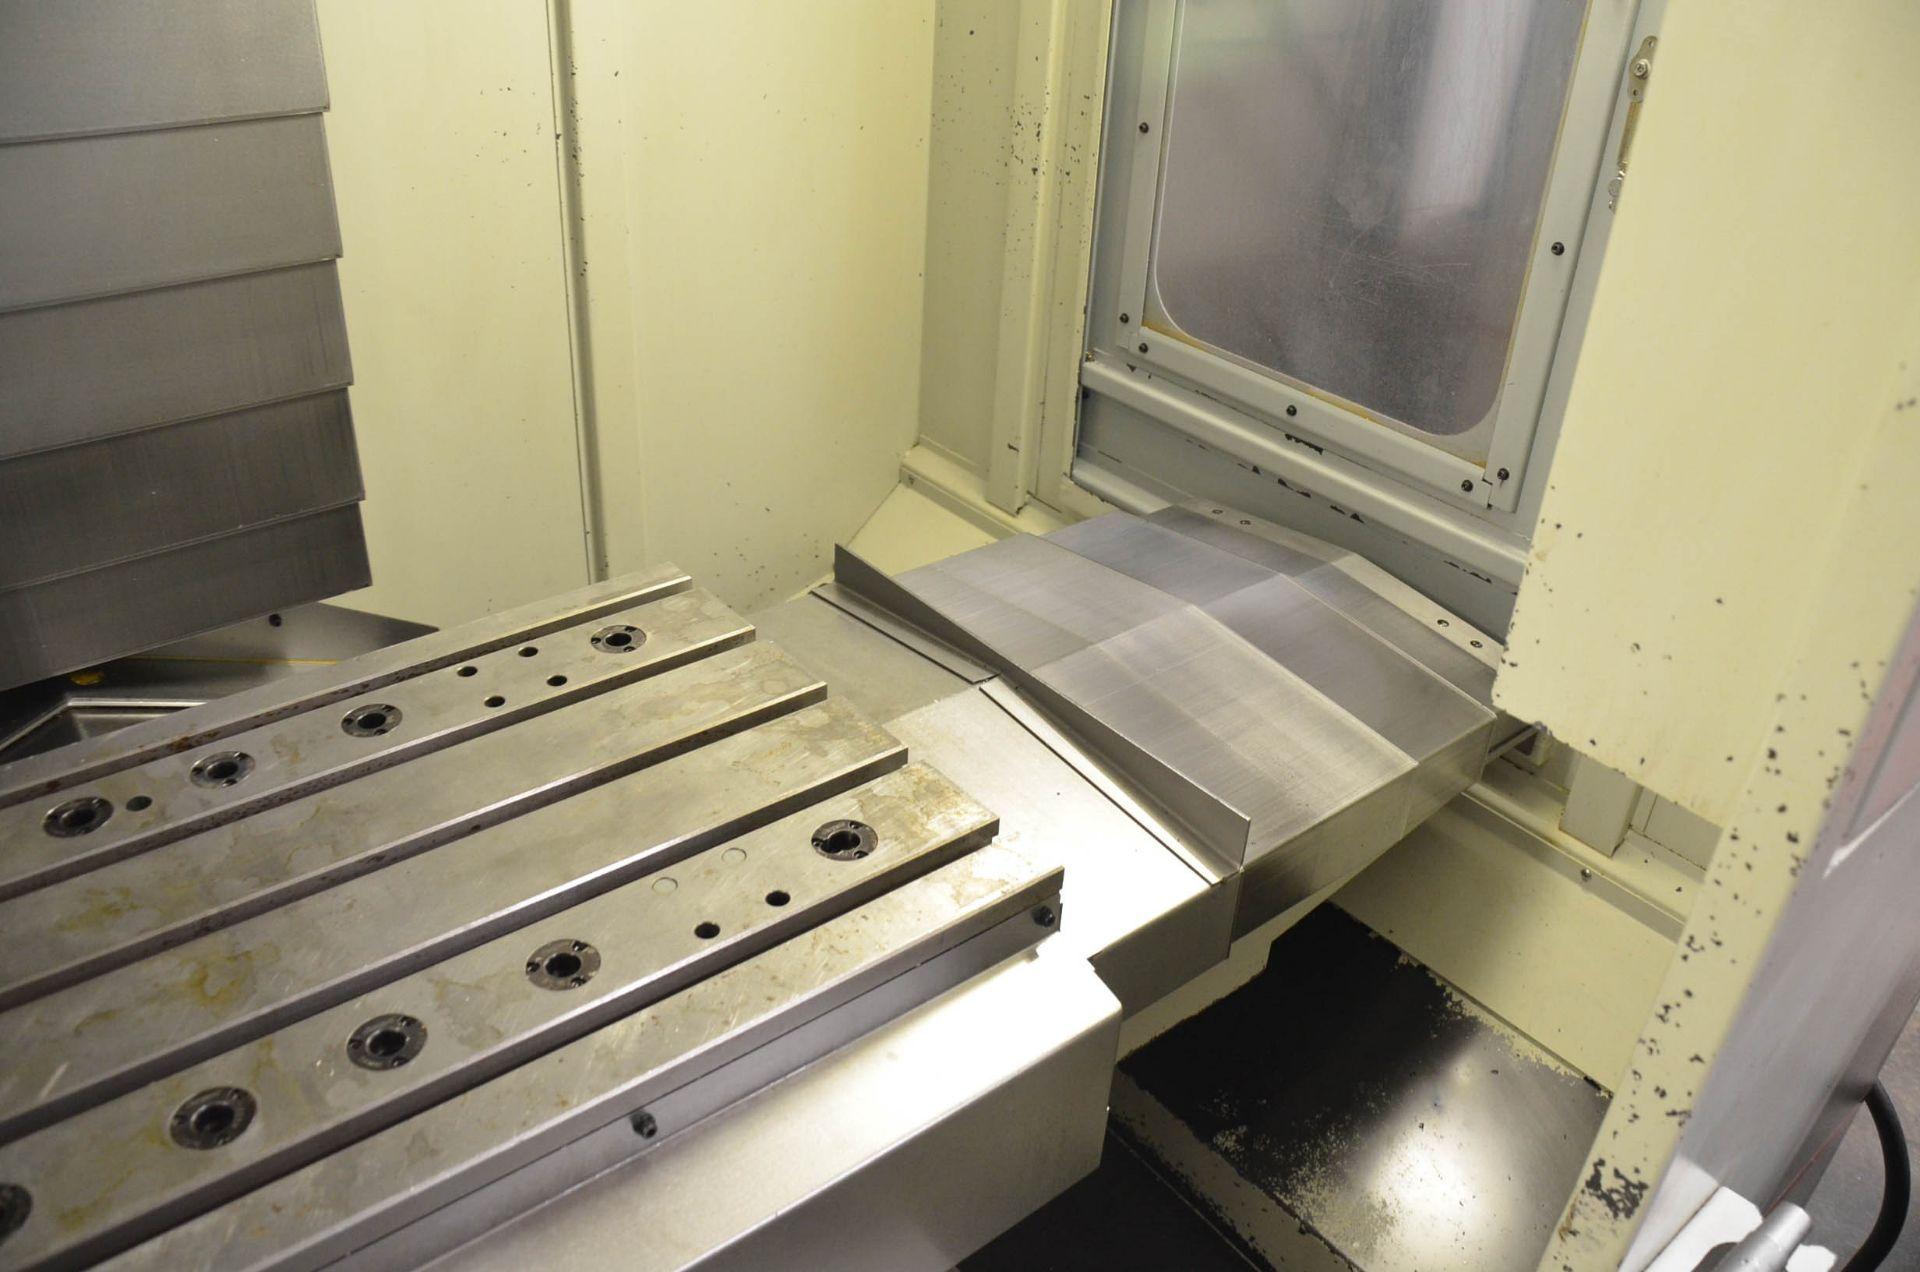 SWI (2012) TRAK LPM 4-AXIS READY CNC VERTICAL MACHINING CENTER WITH PROTO TRAK PMX CNC CONTROL, 19. - Image 8 of 10